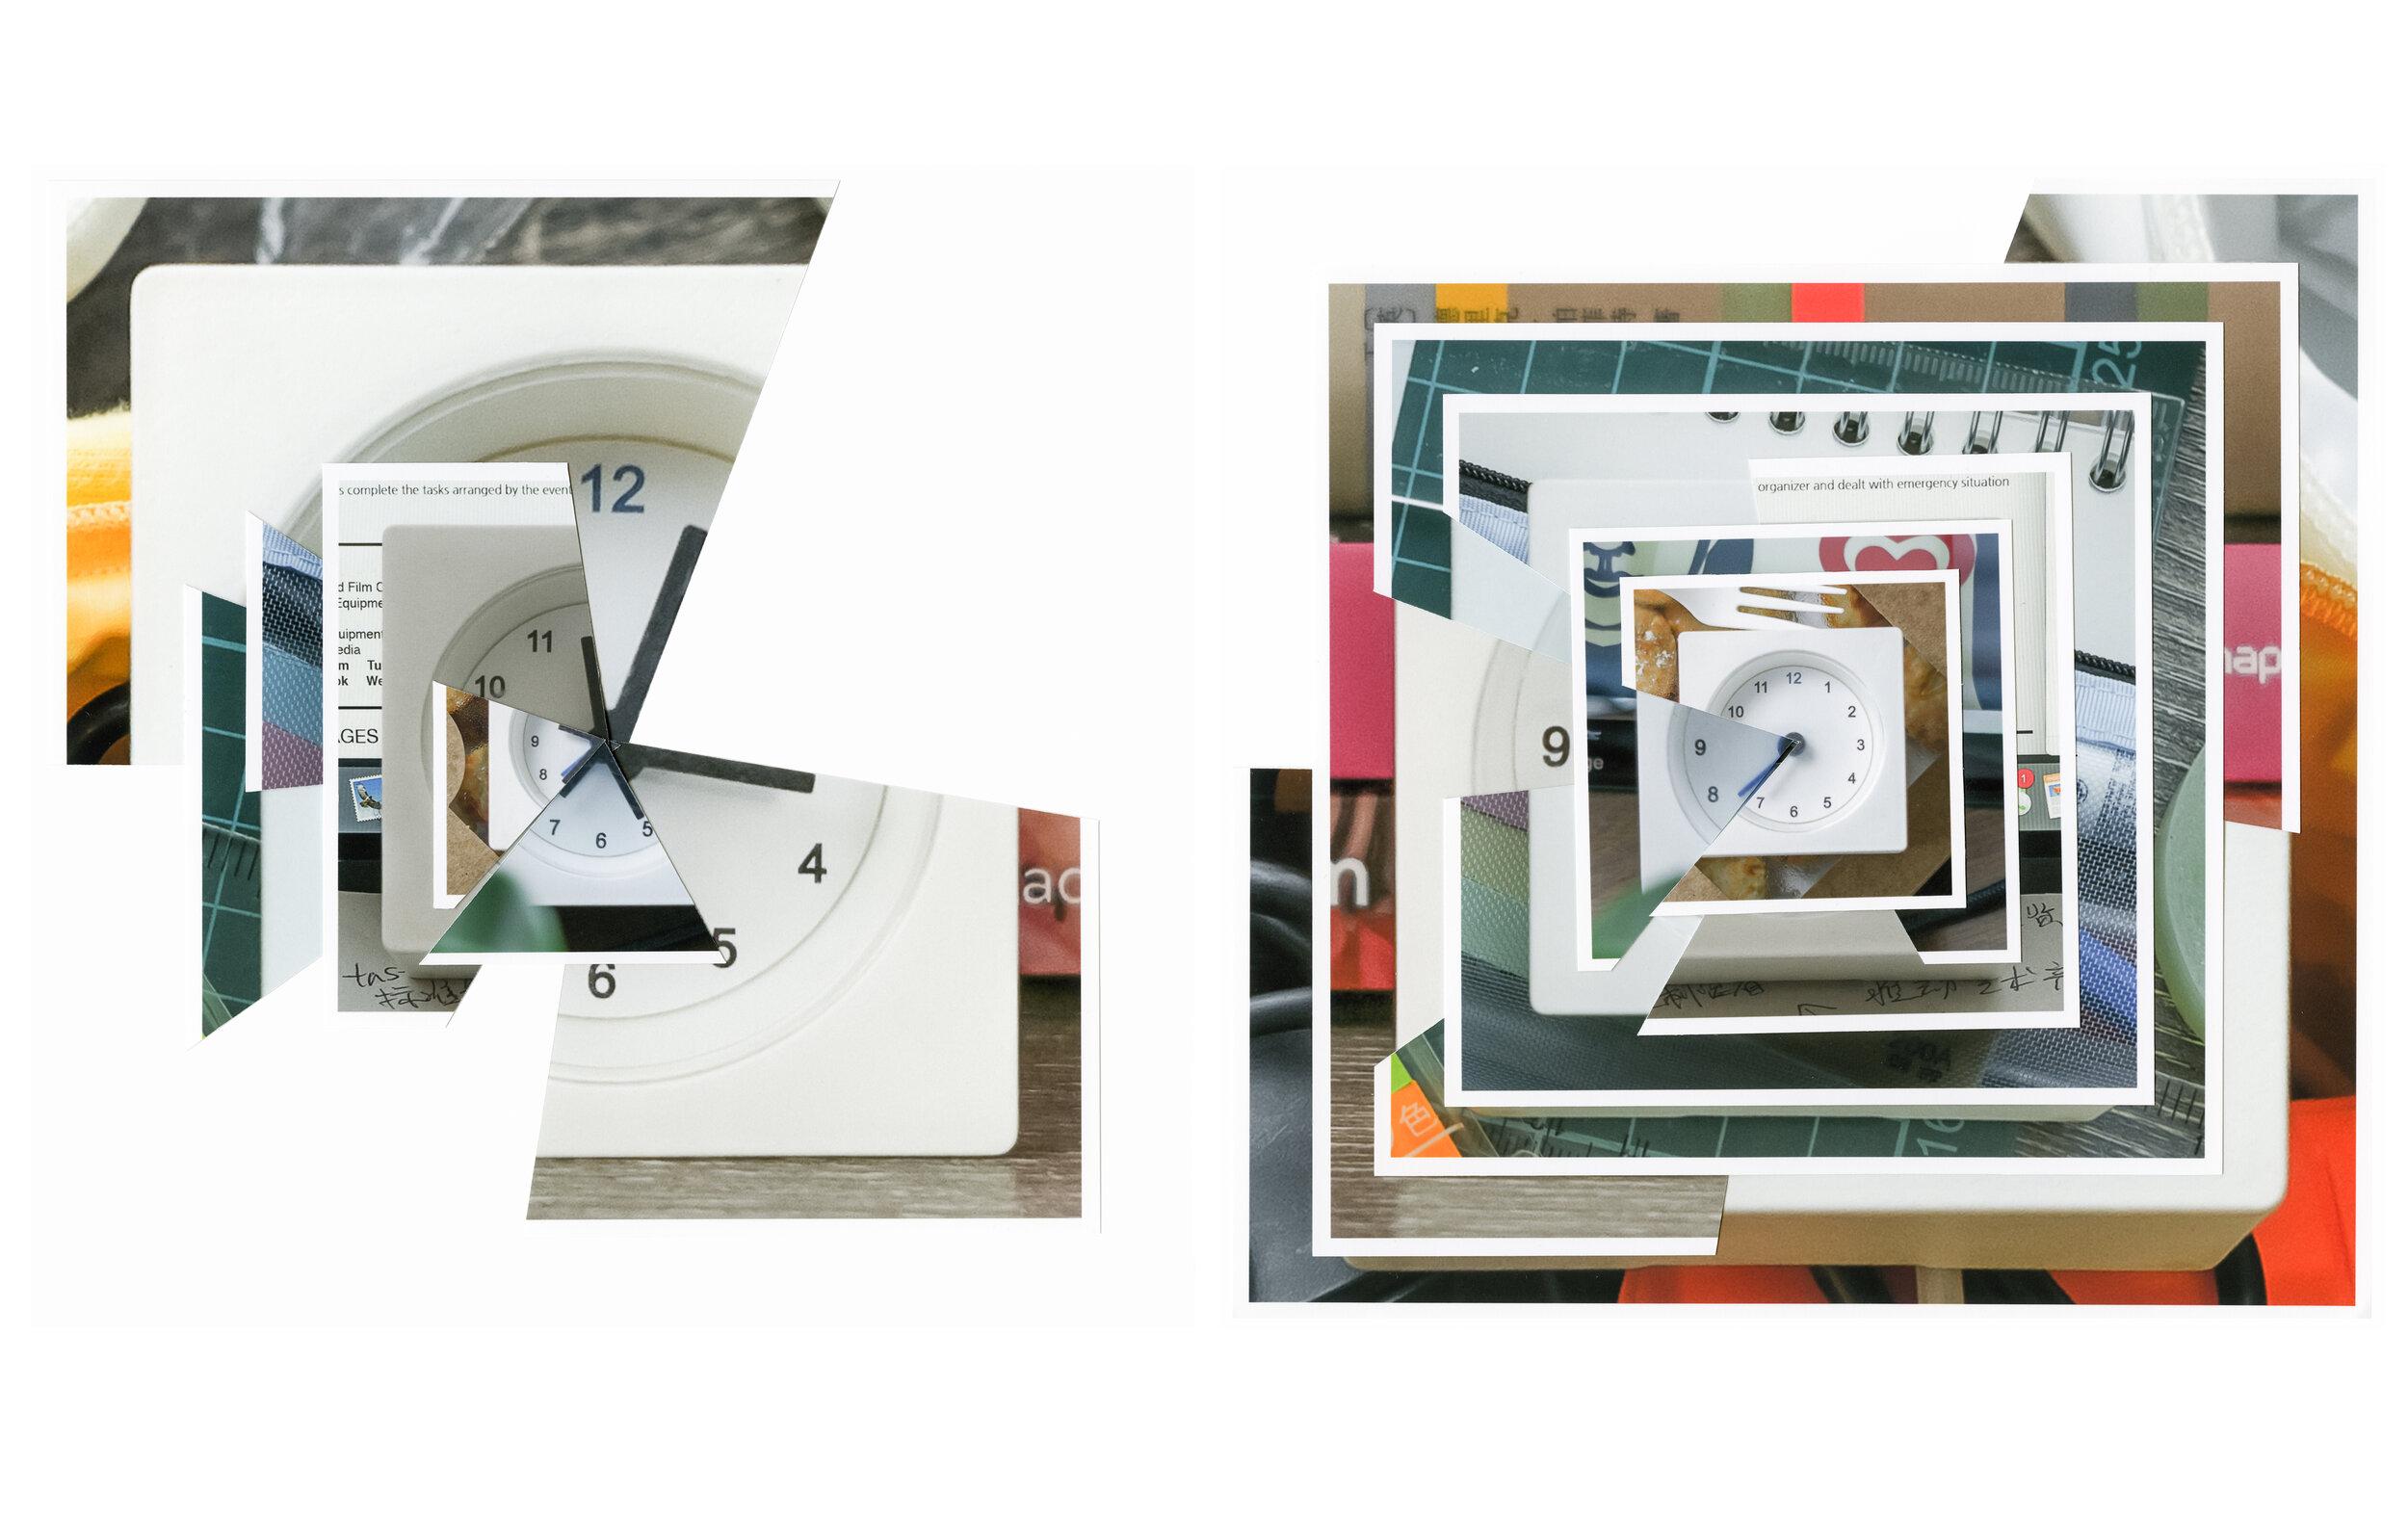 SVA GALLERIES, Yuan Zhang, The Clock, 2018-2019, Archival inkjet print,detail_dimensionsvariable.jpg